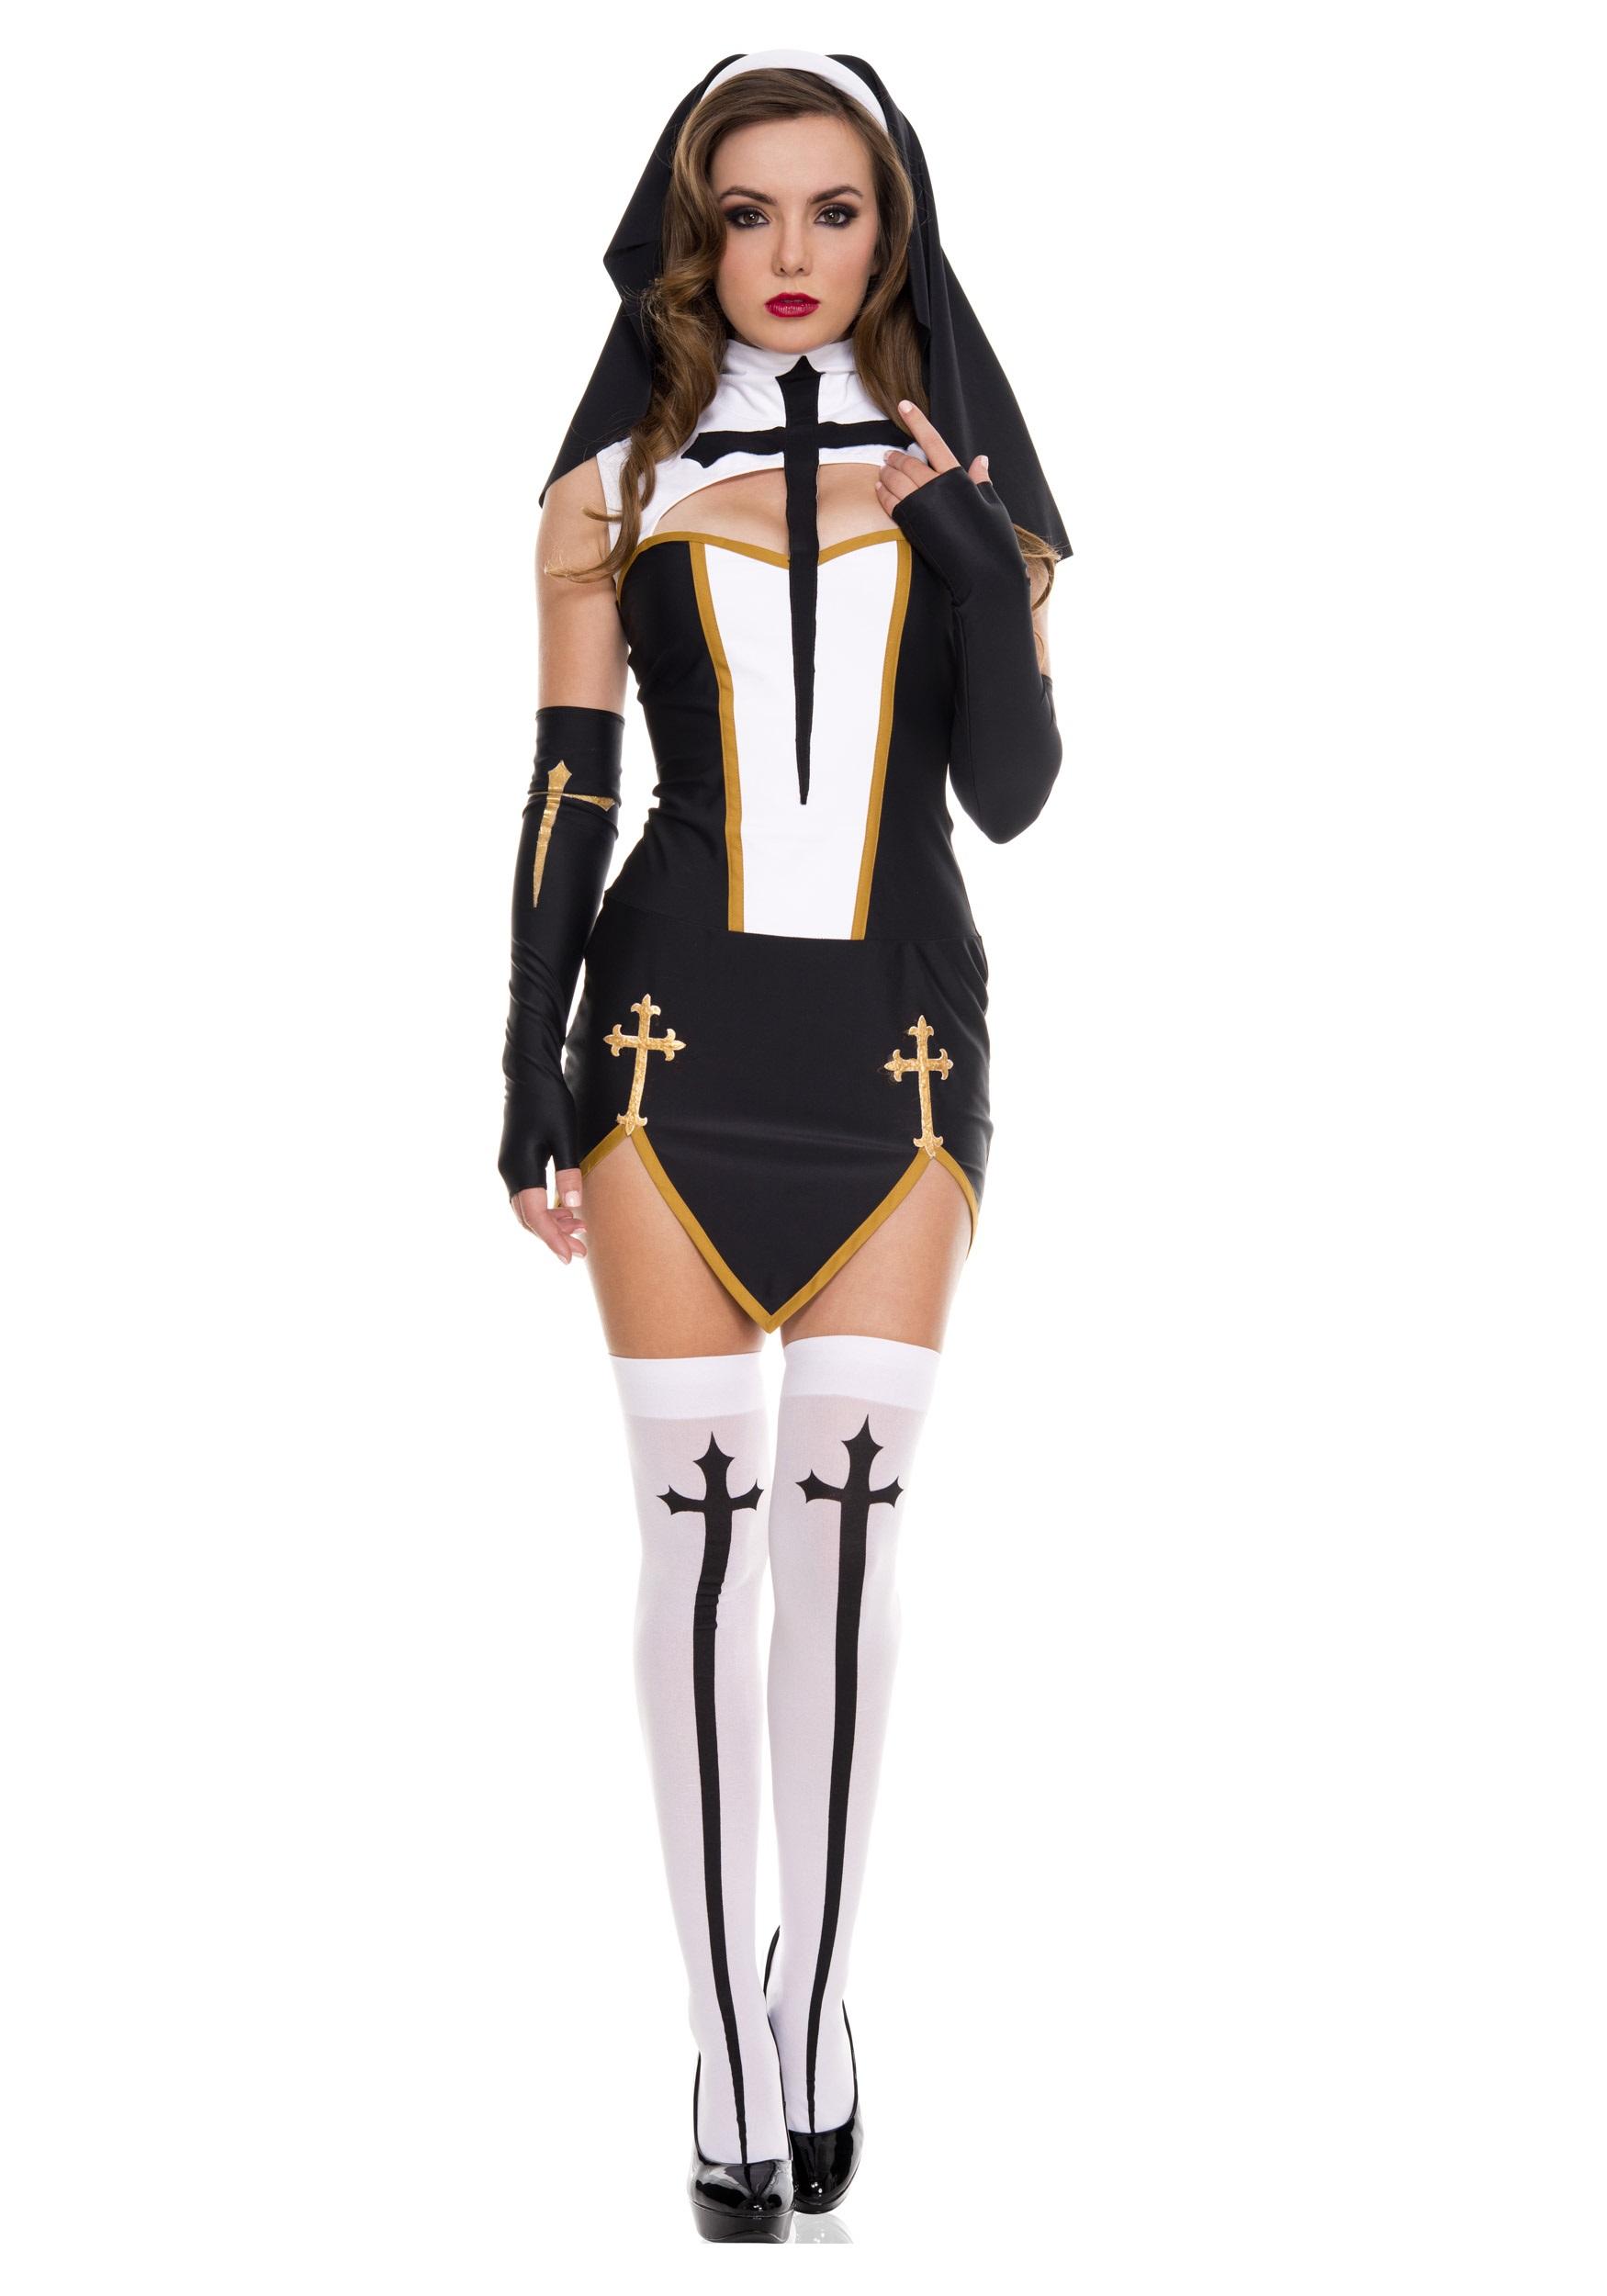 Bad Habit Nun Costume for Women